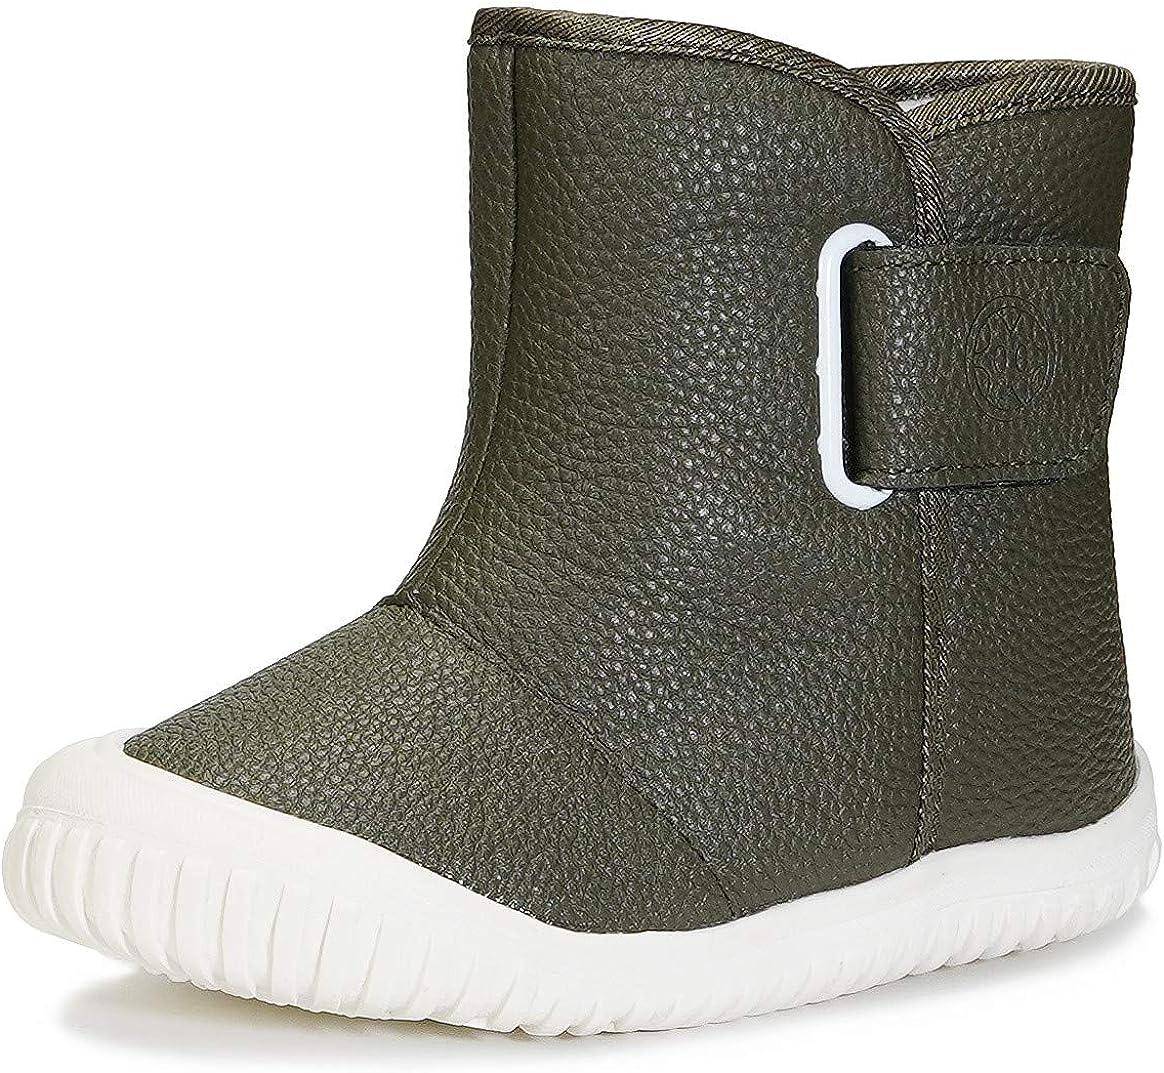 KVbabby Kids Winter Warm Snow Girl's Sales Boy's Lined Boots Fur It is very popular